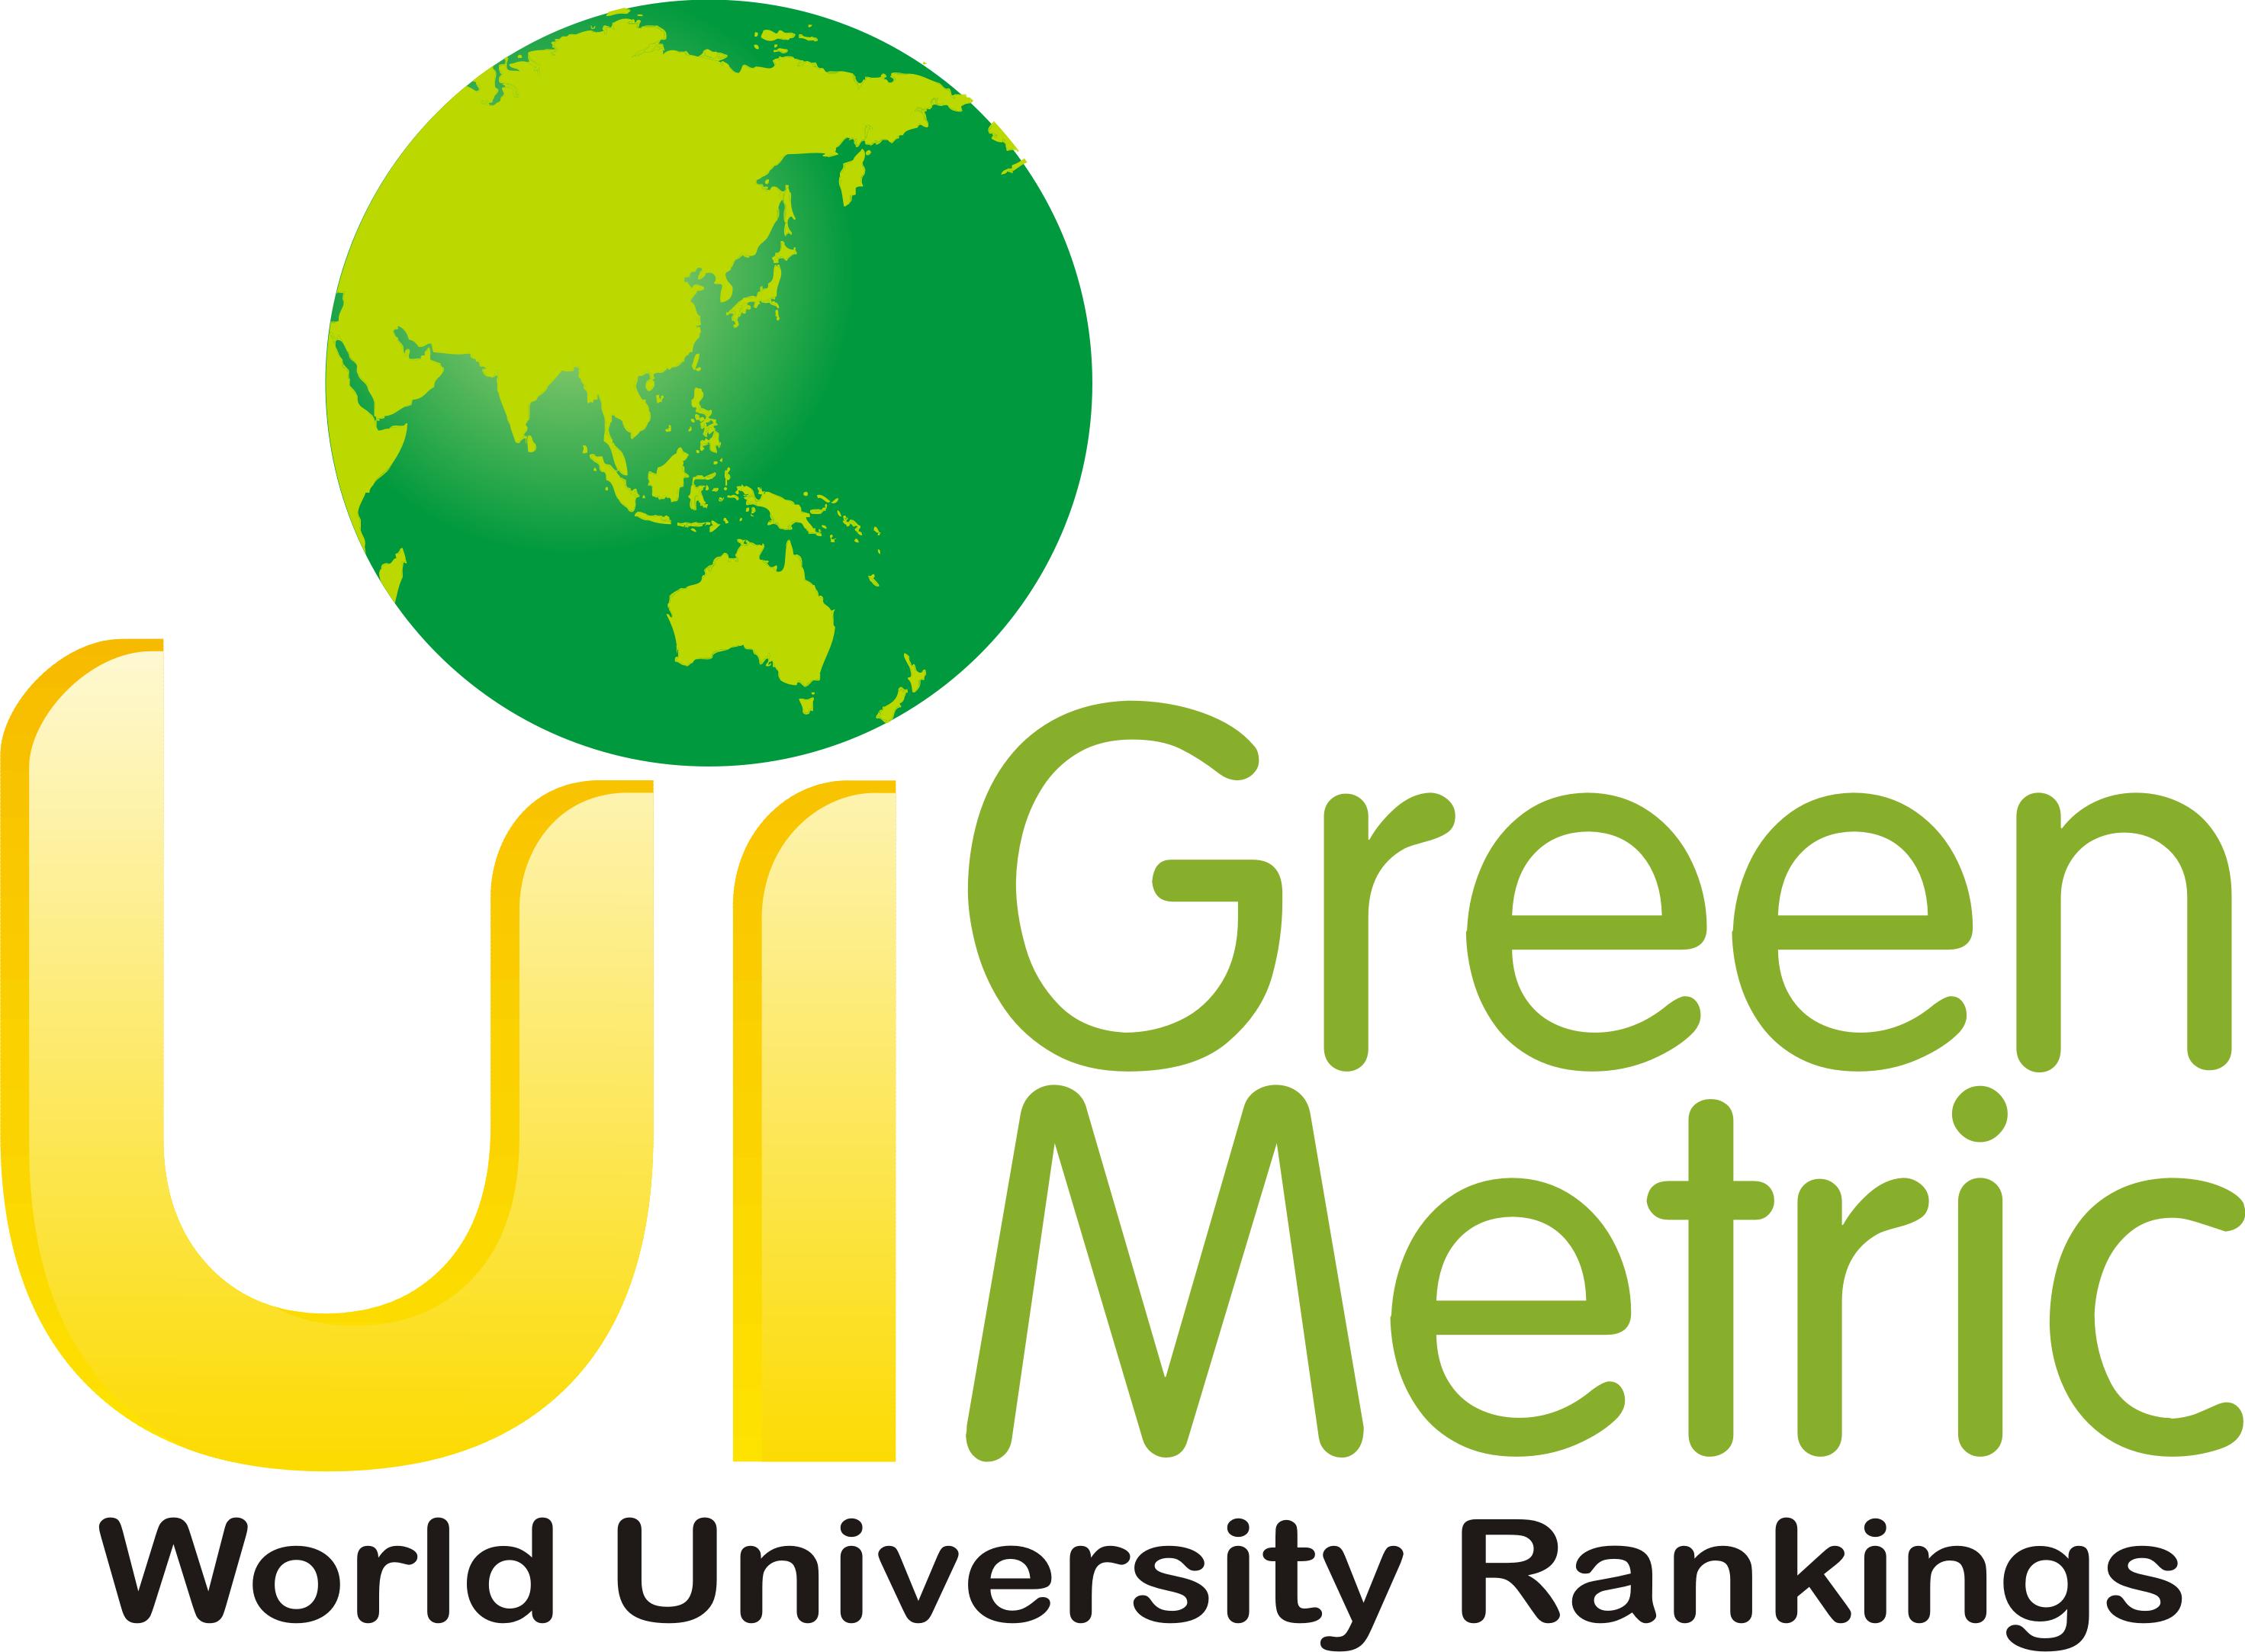 UI GreenMetric | World University Rankings